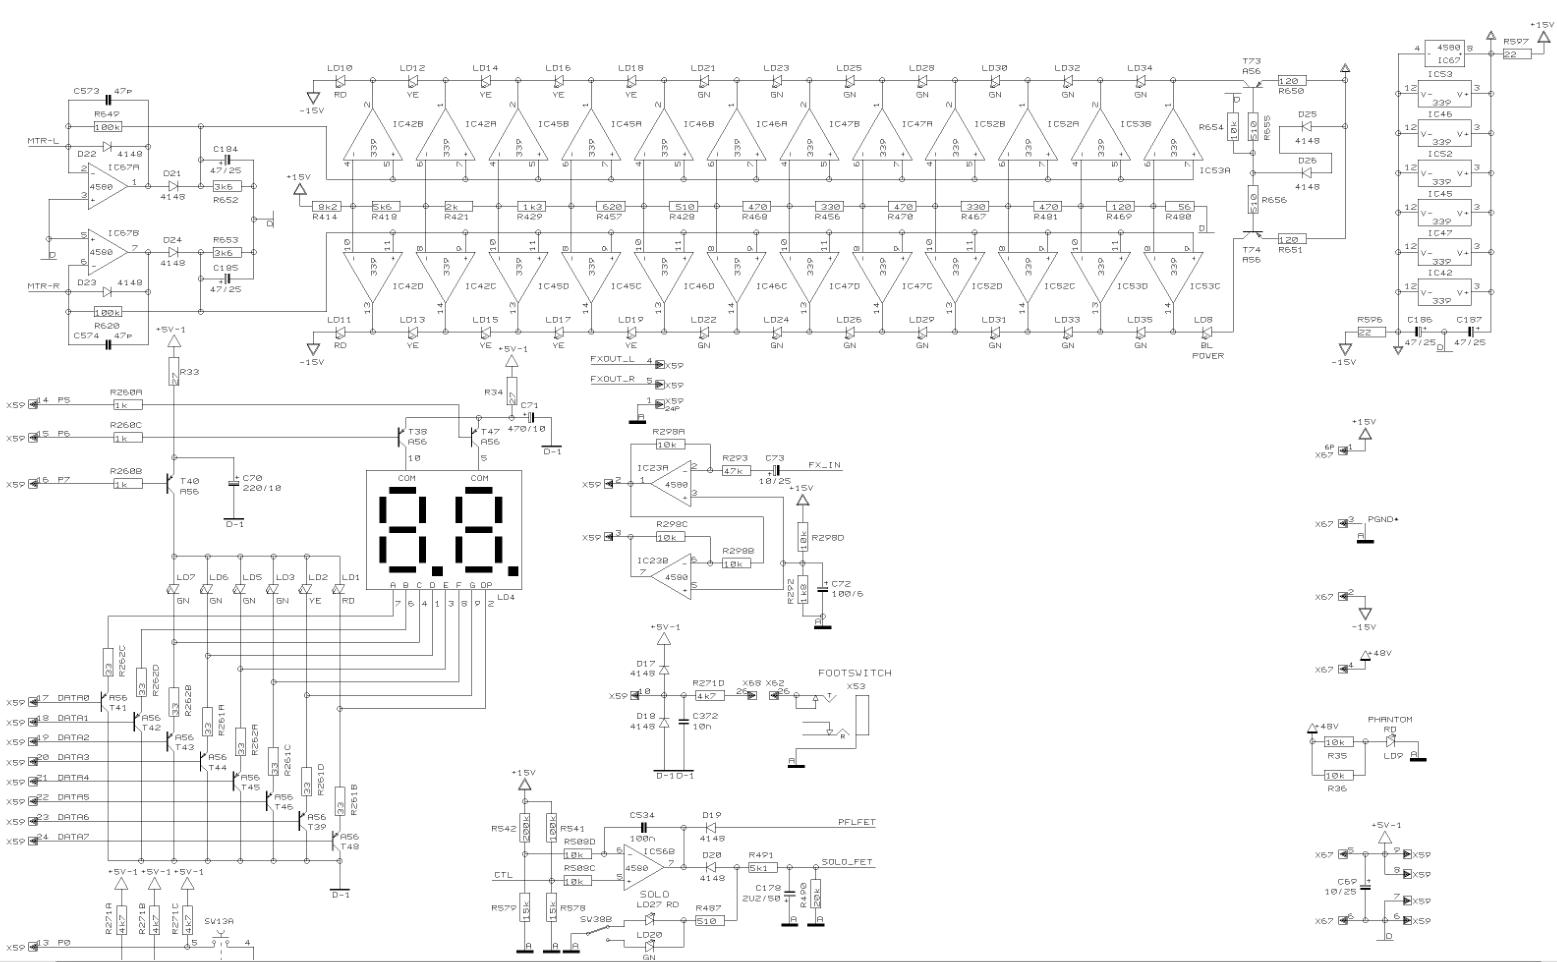 behringer xenyx x2222usb vu meters repair and inside teardown rh alfredoblogspage blogspot com Block Diagrams Interior Design Electrical Block Diagram